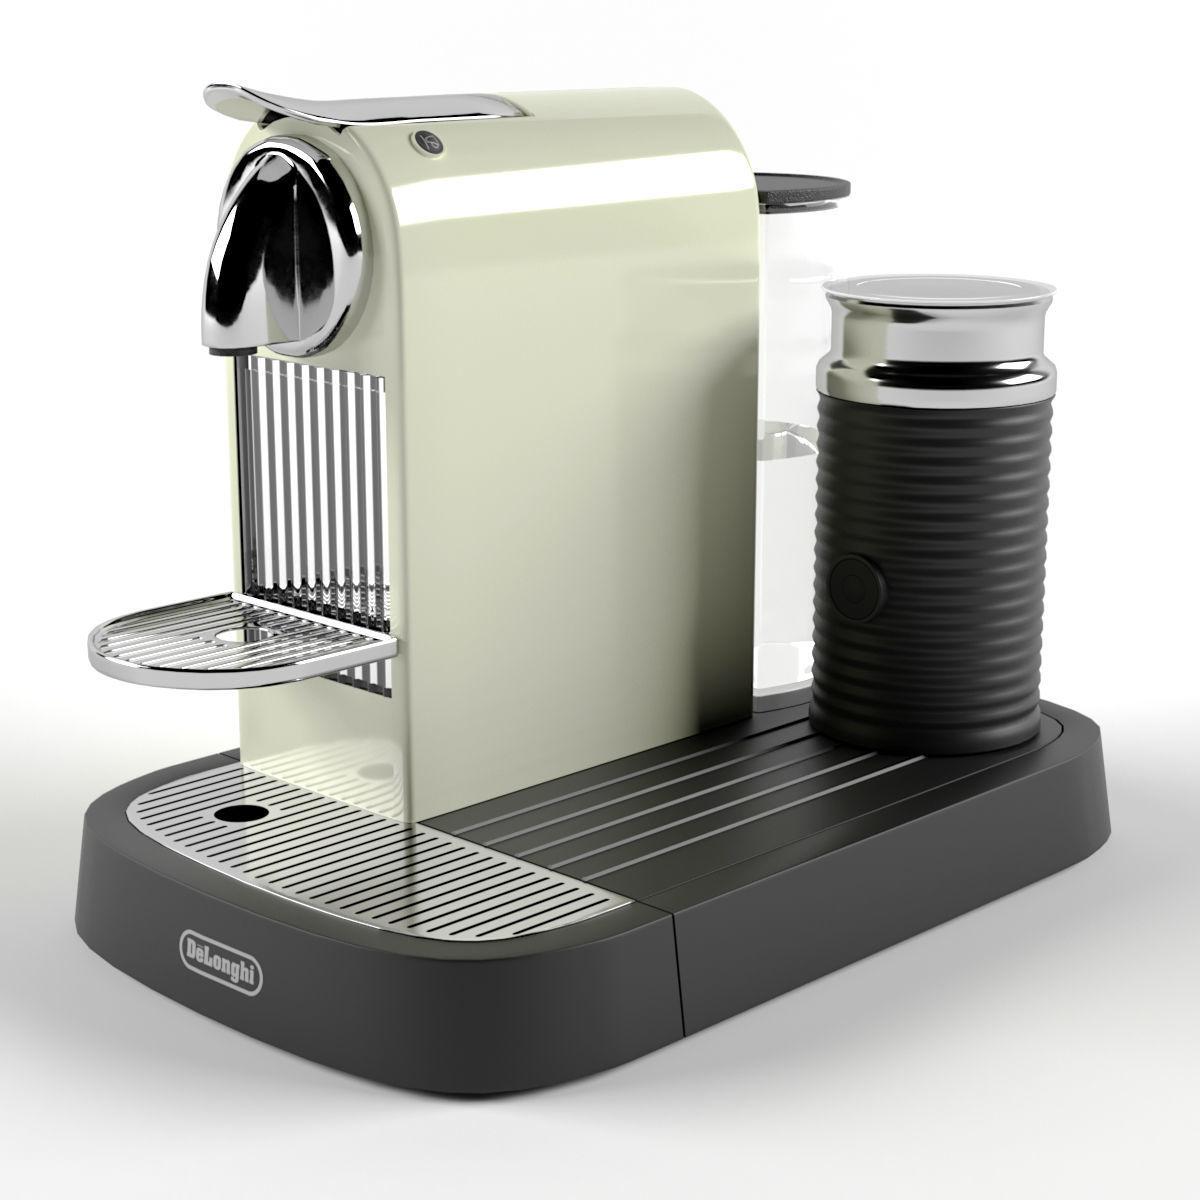 Nespresso DeLonghi Cityz and Milk EN266 CWAE